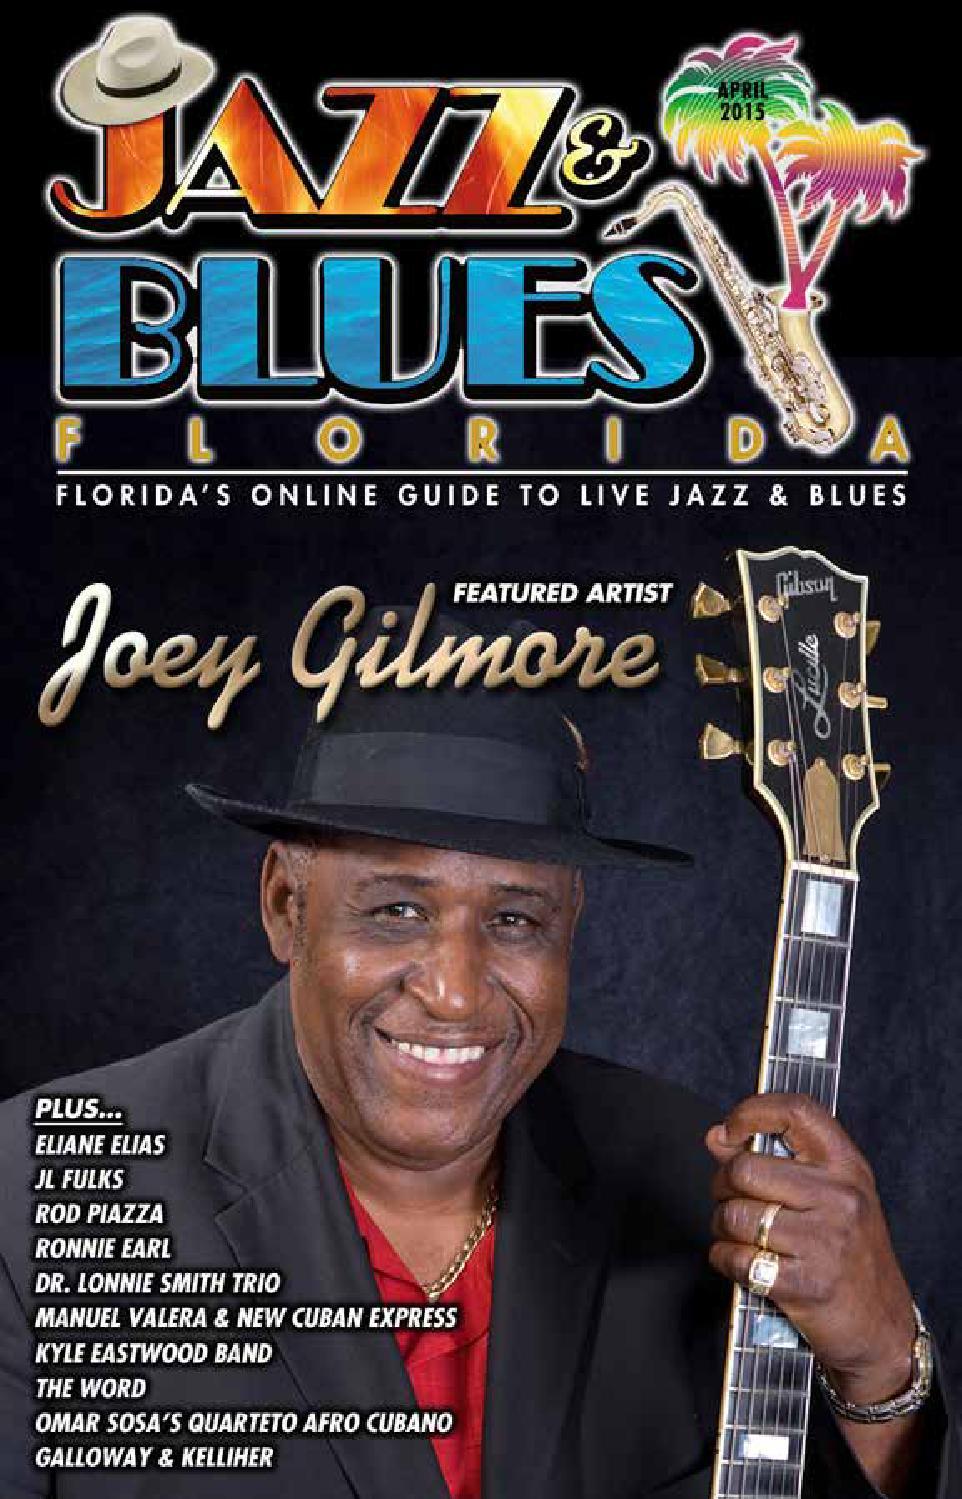 Jazz & Blues Florida April 2015 Edition by JazzBluesFlorida